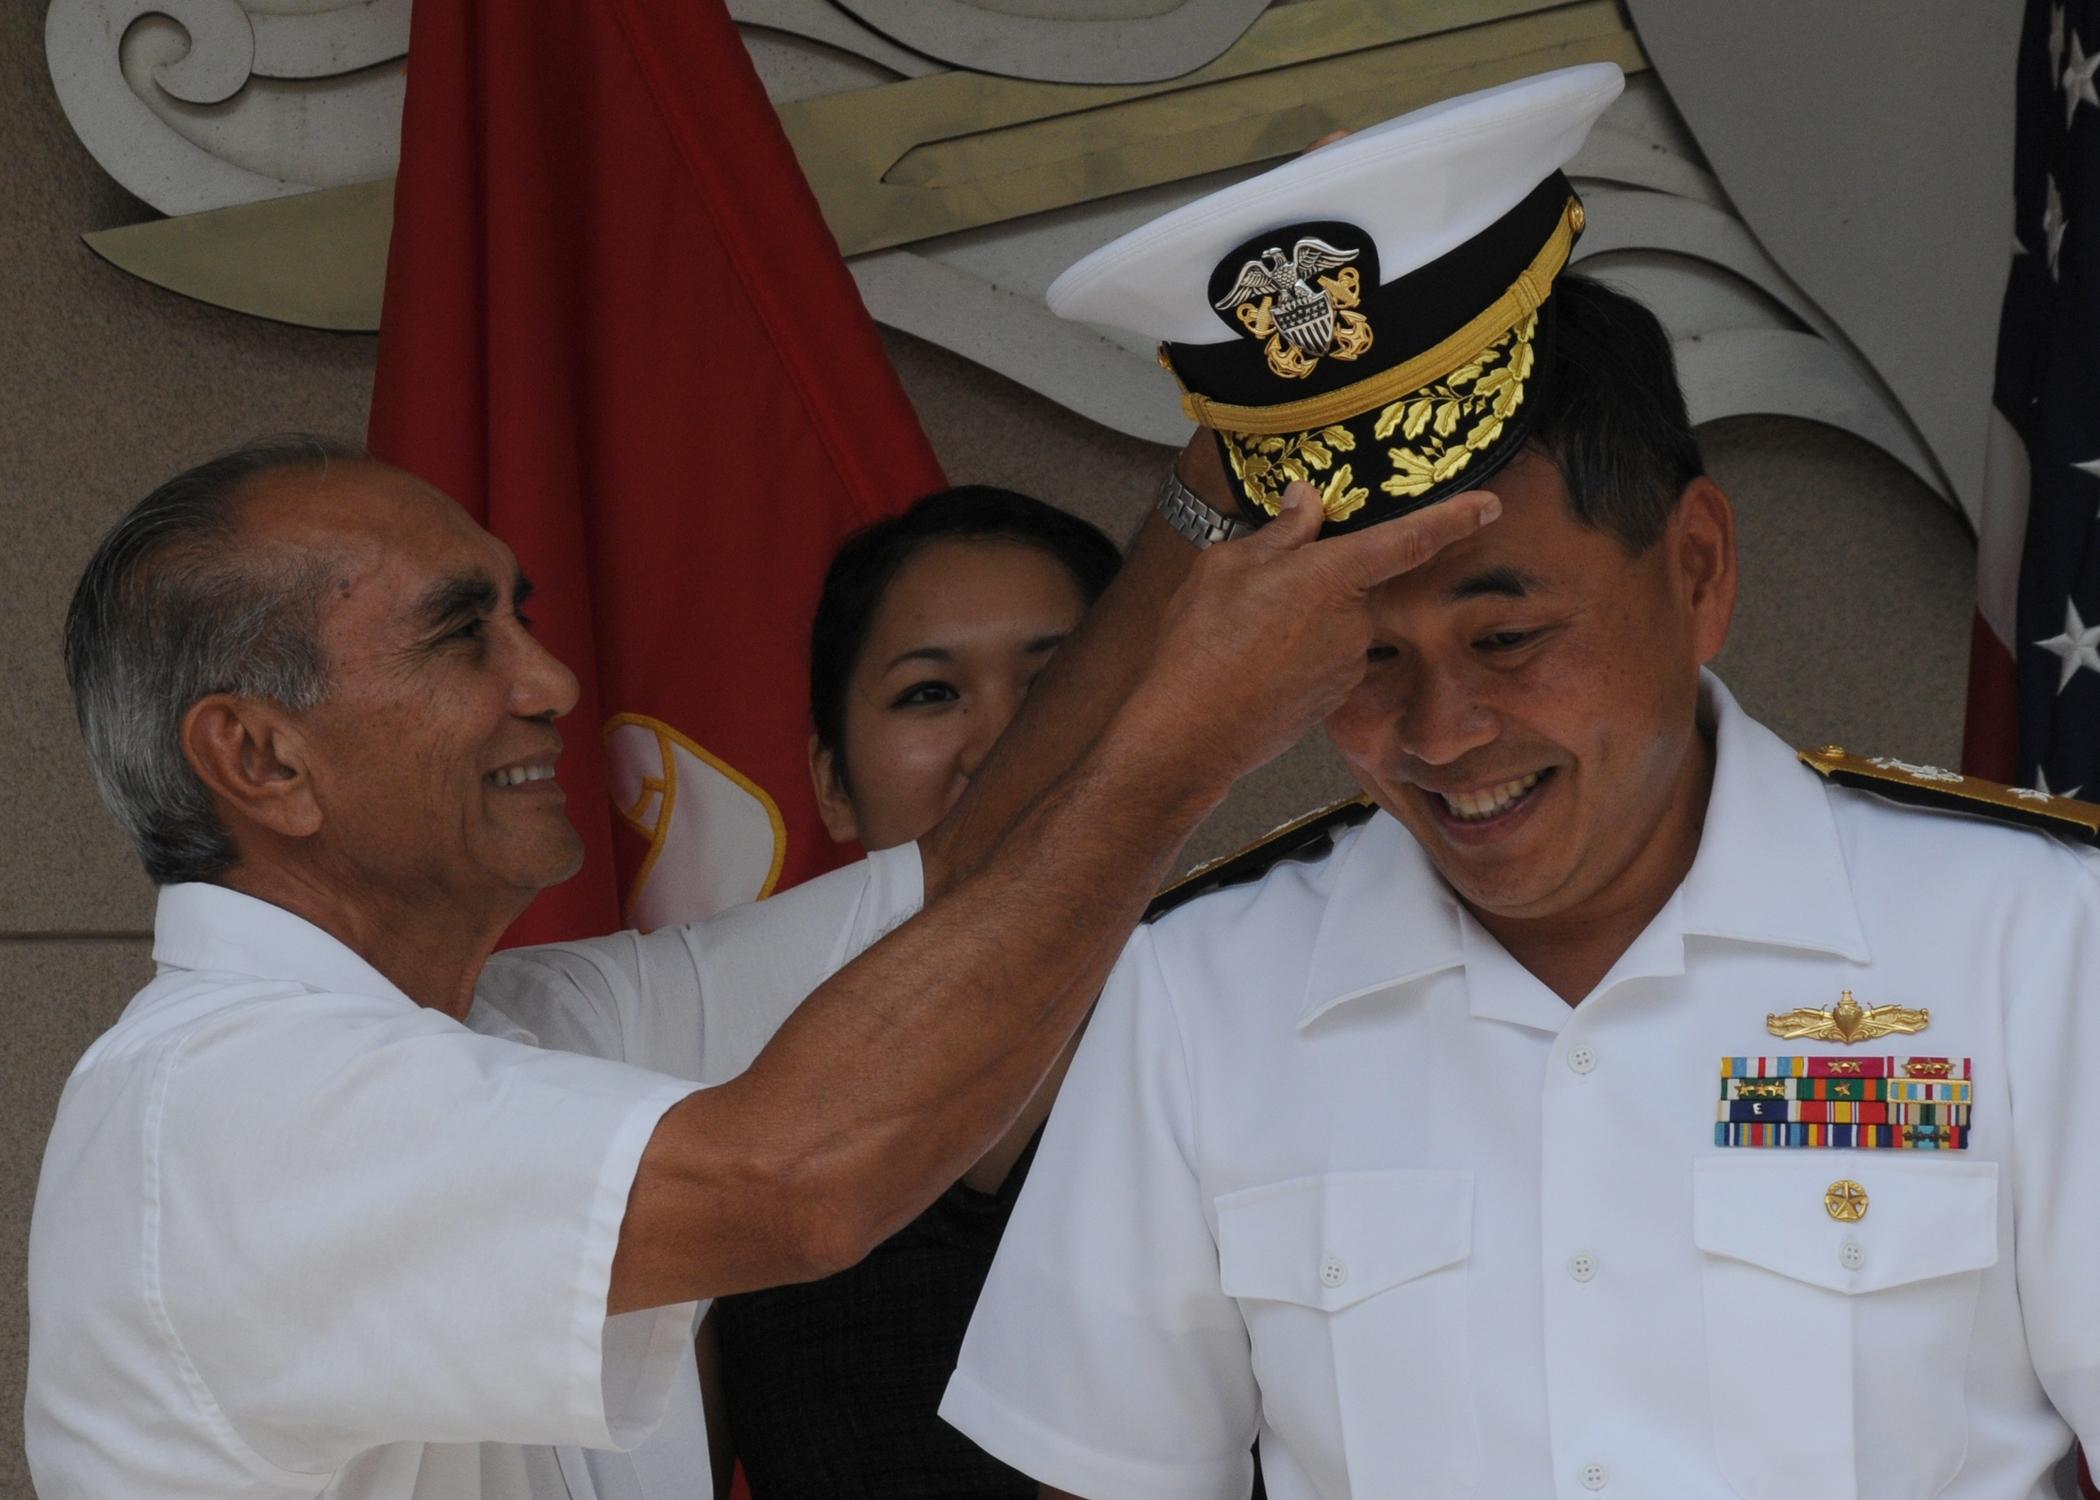 098a6e4276e73c File:US Navy 090911-N-0569T-212 Rear Adm. Peter Gumataotao receives ...